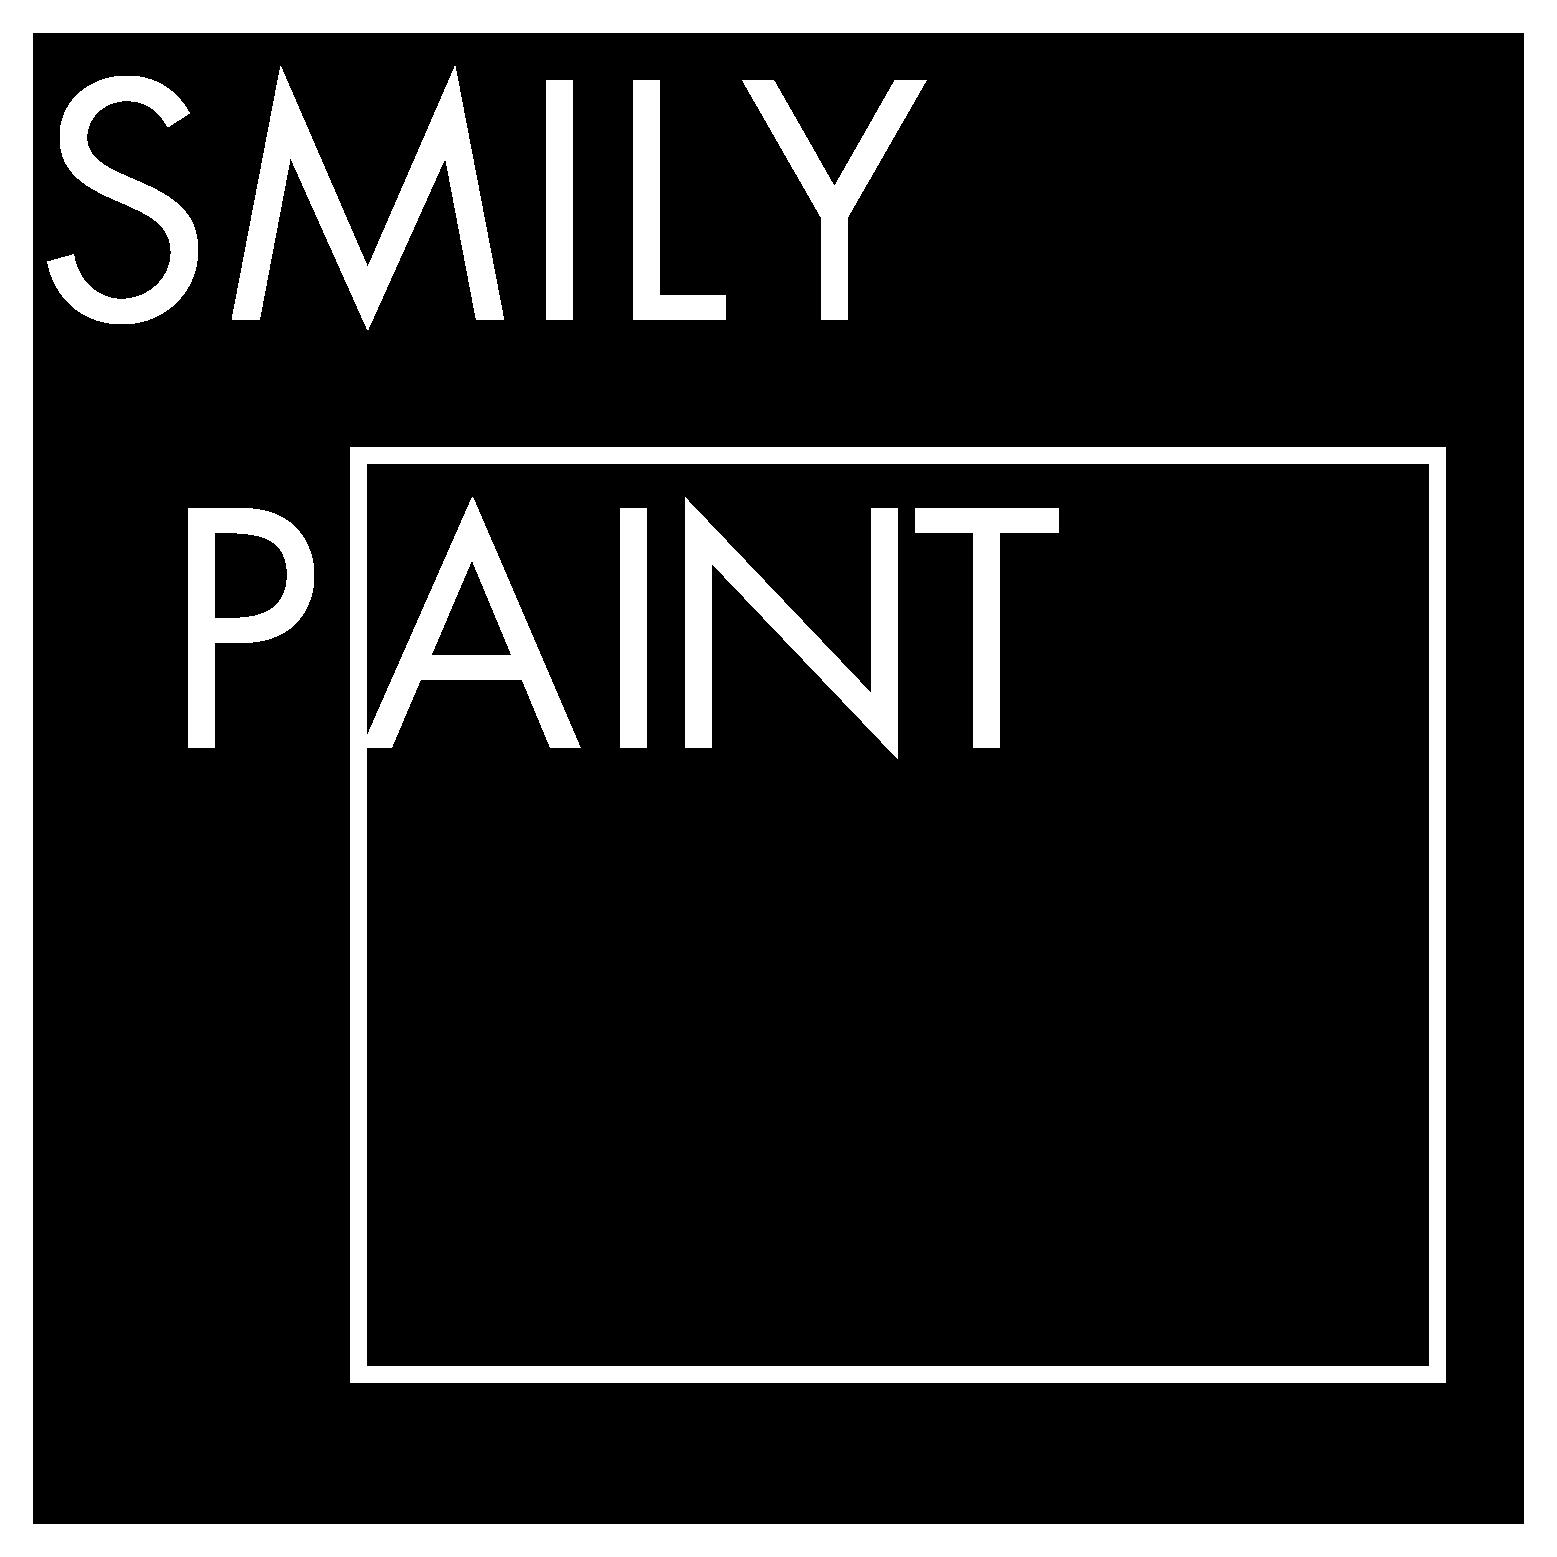 SMILY PAINTメインロゴ